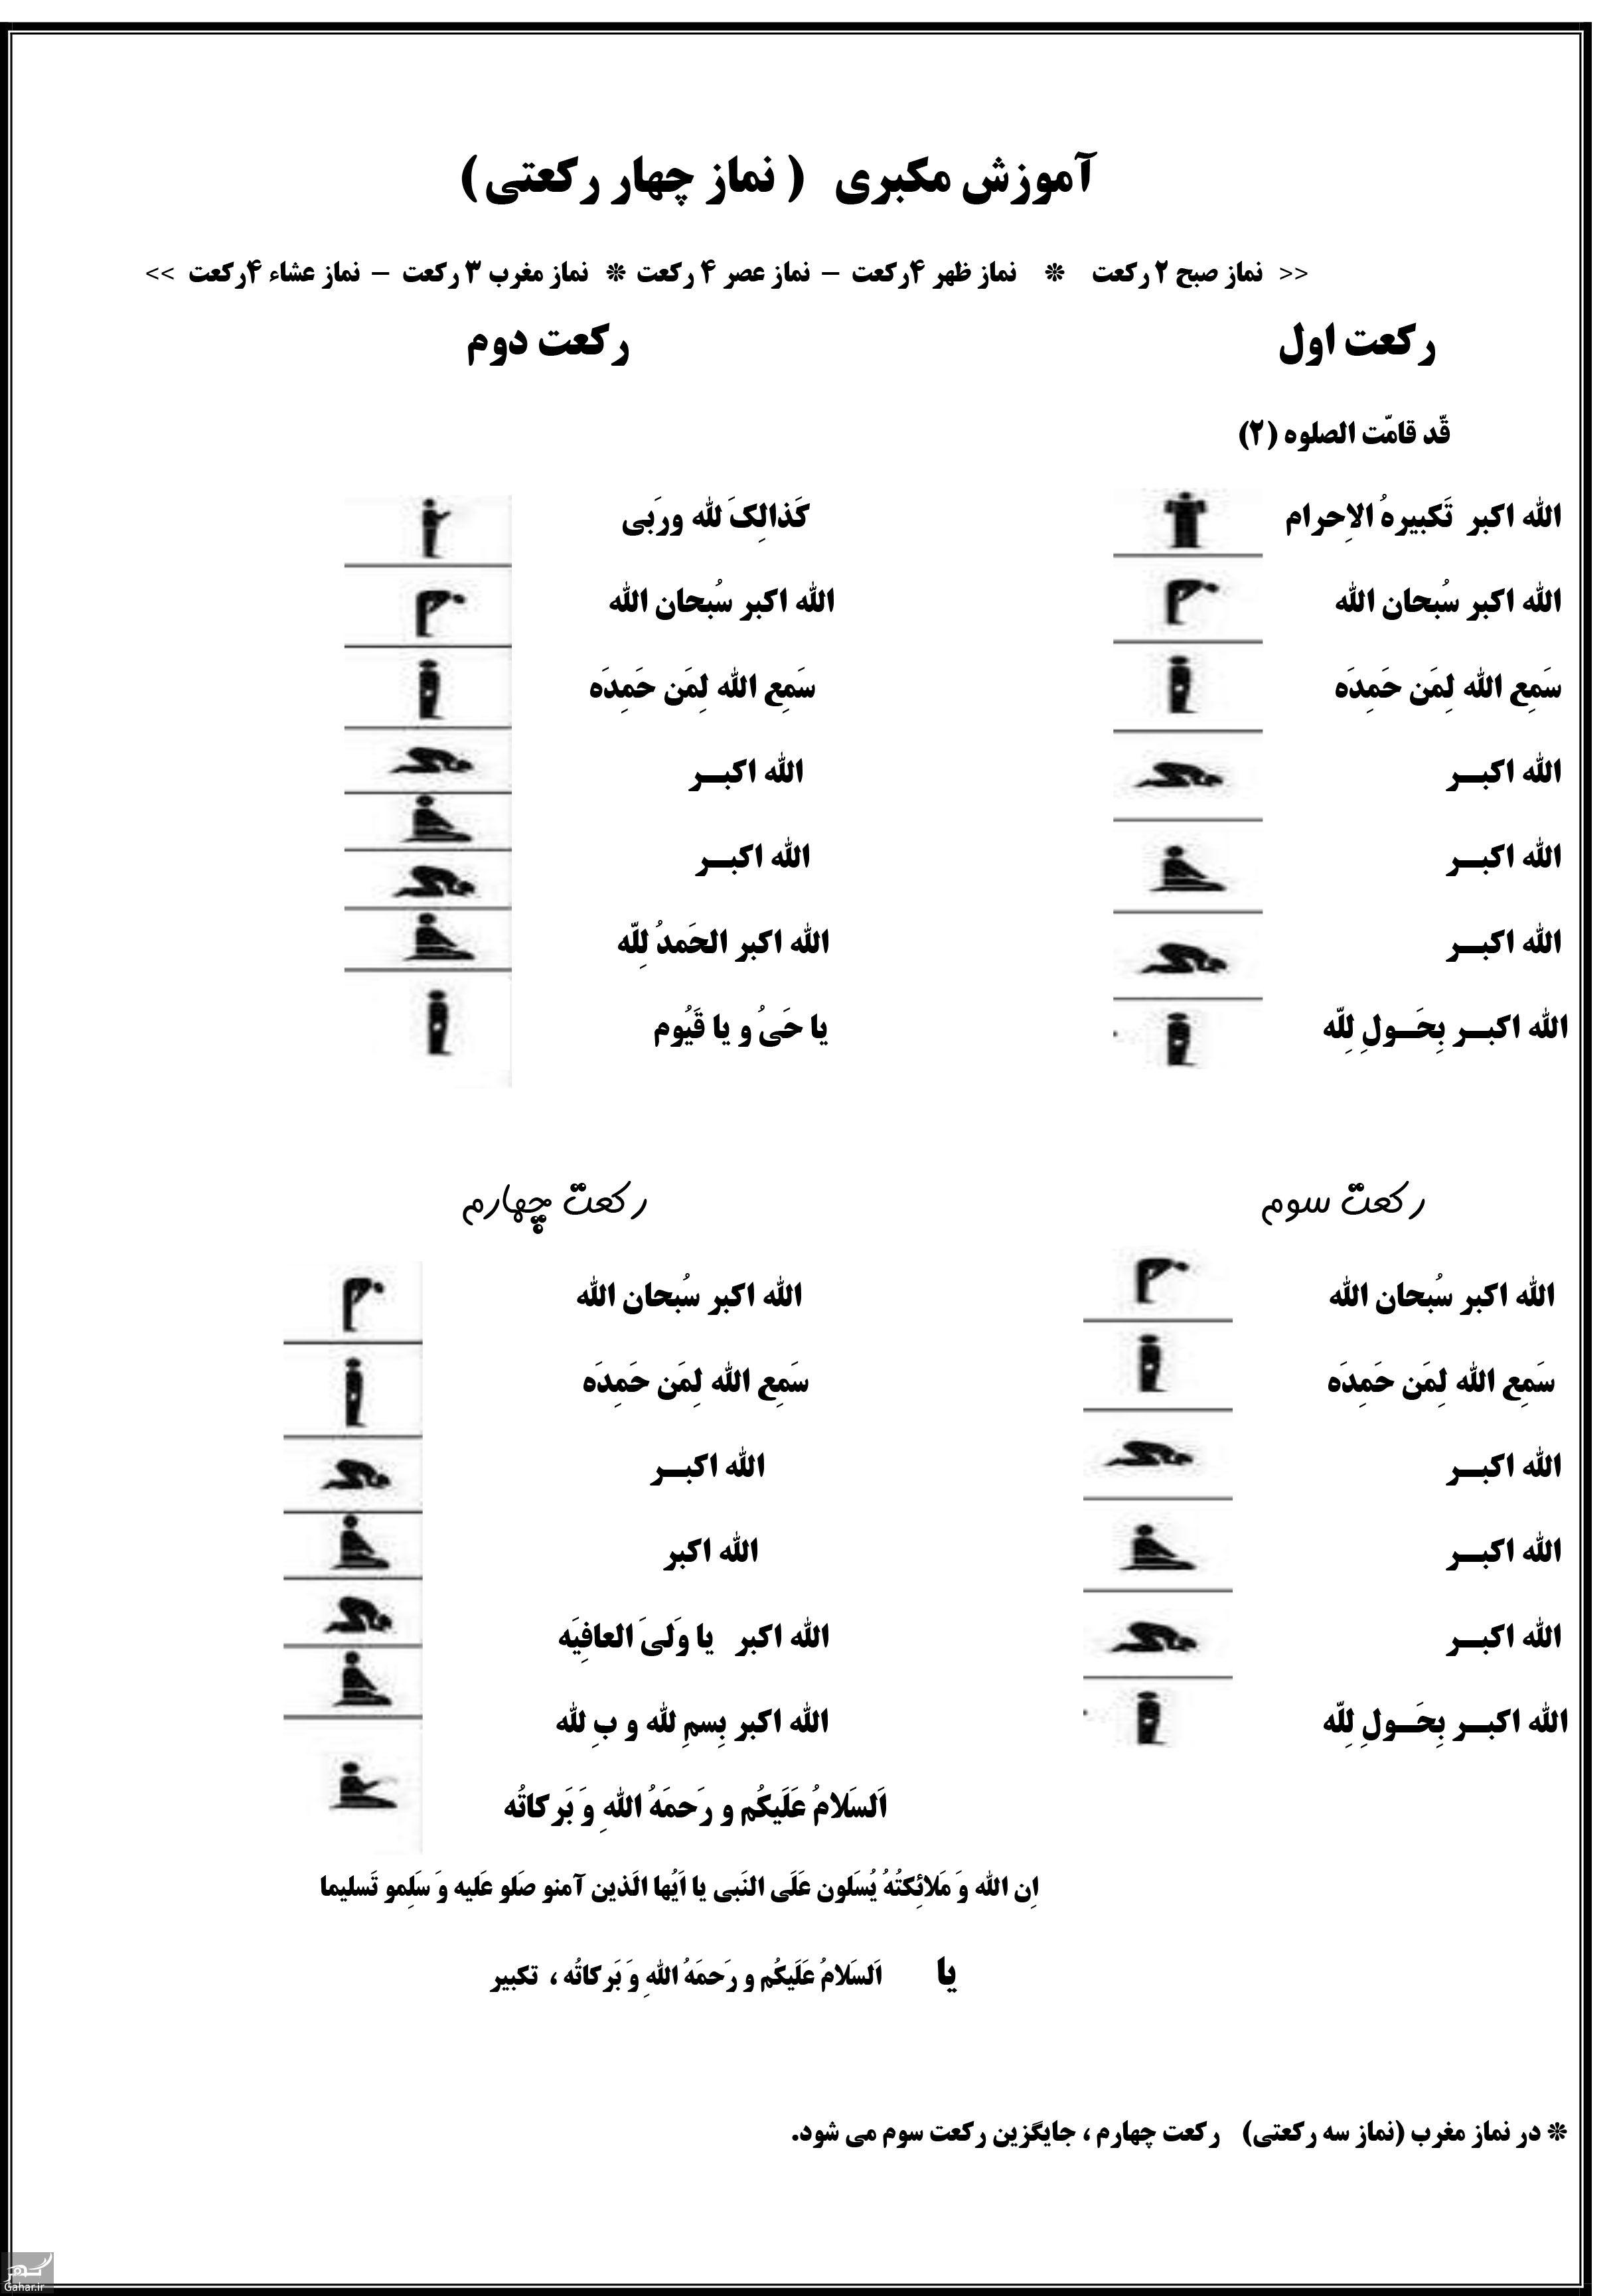 637209 Gahar ir آموزش خواندن نماز عید فطر